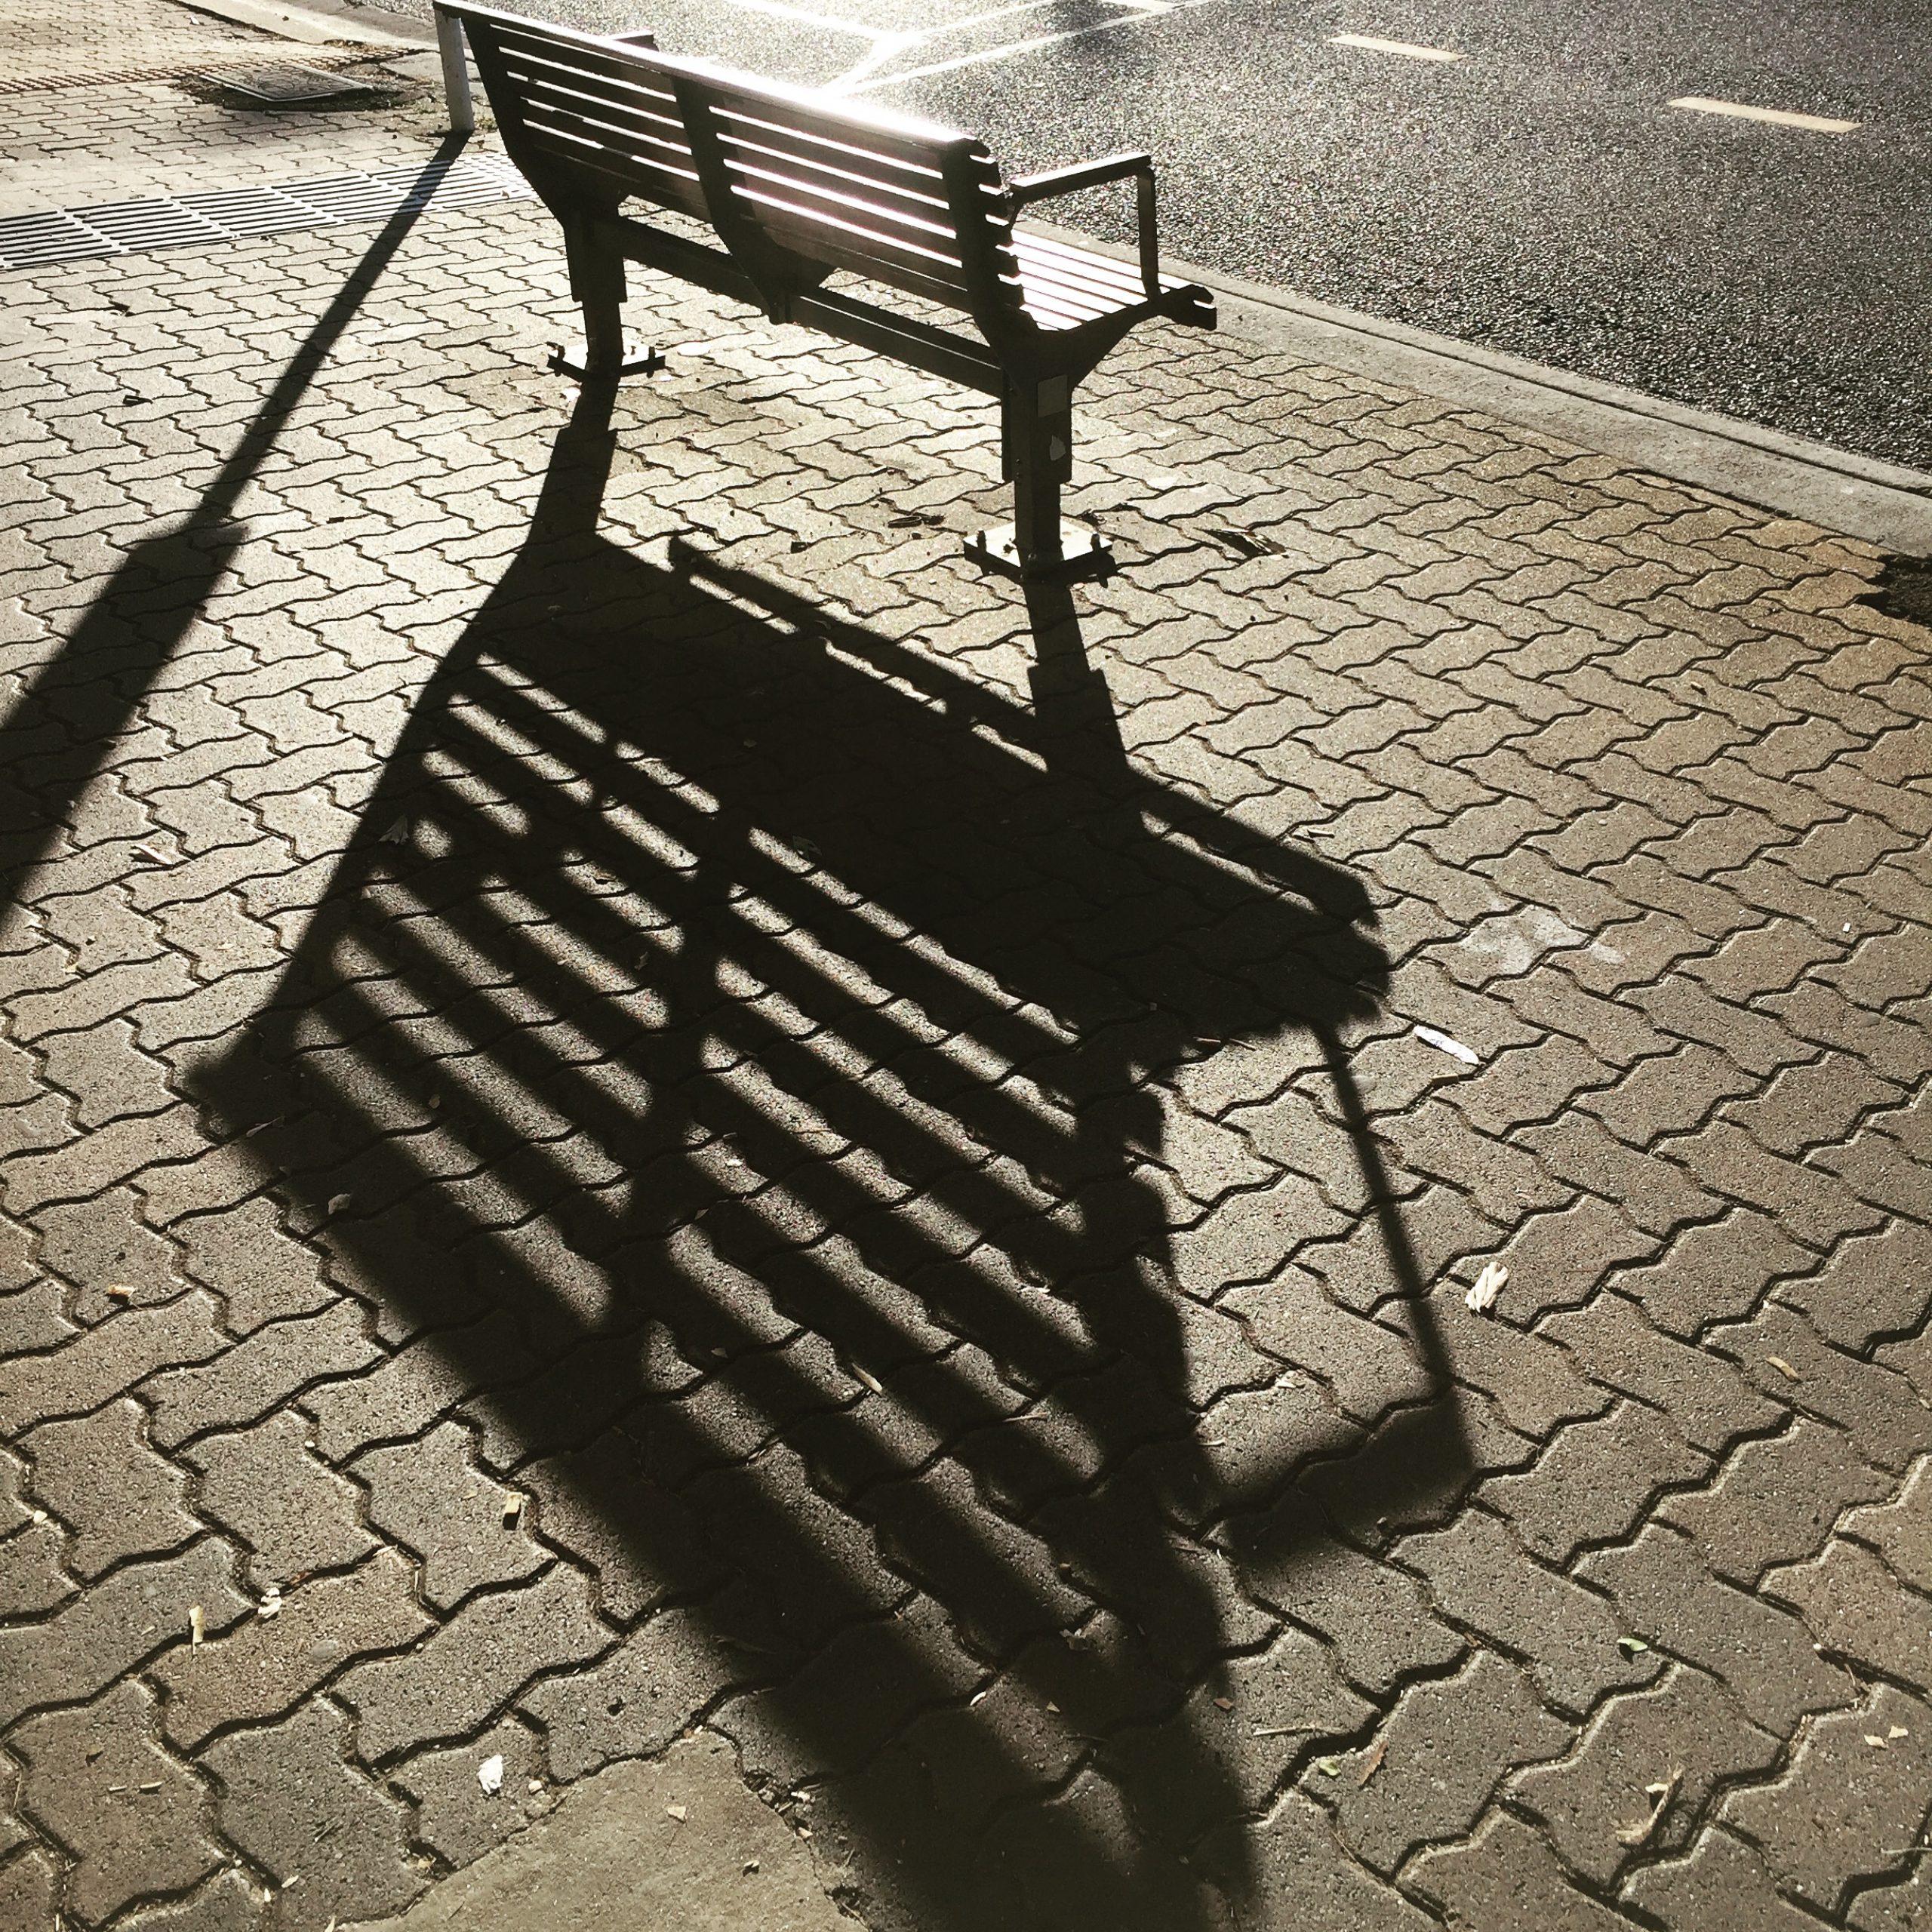 Seating along the way